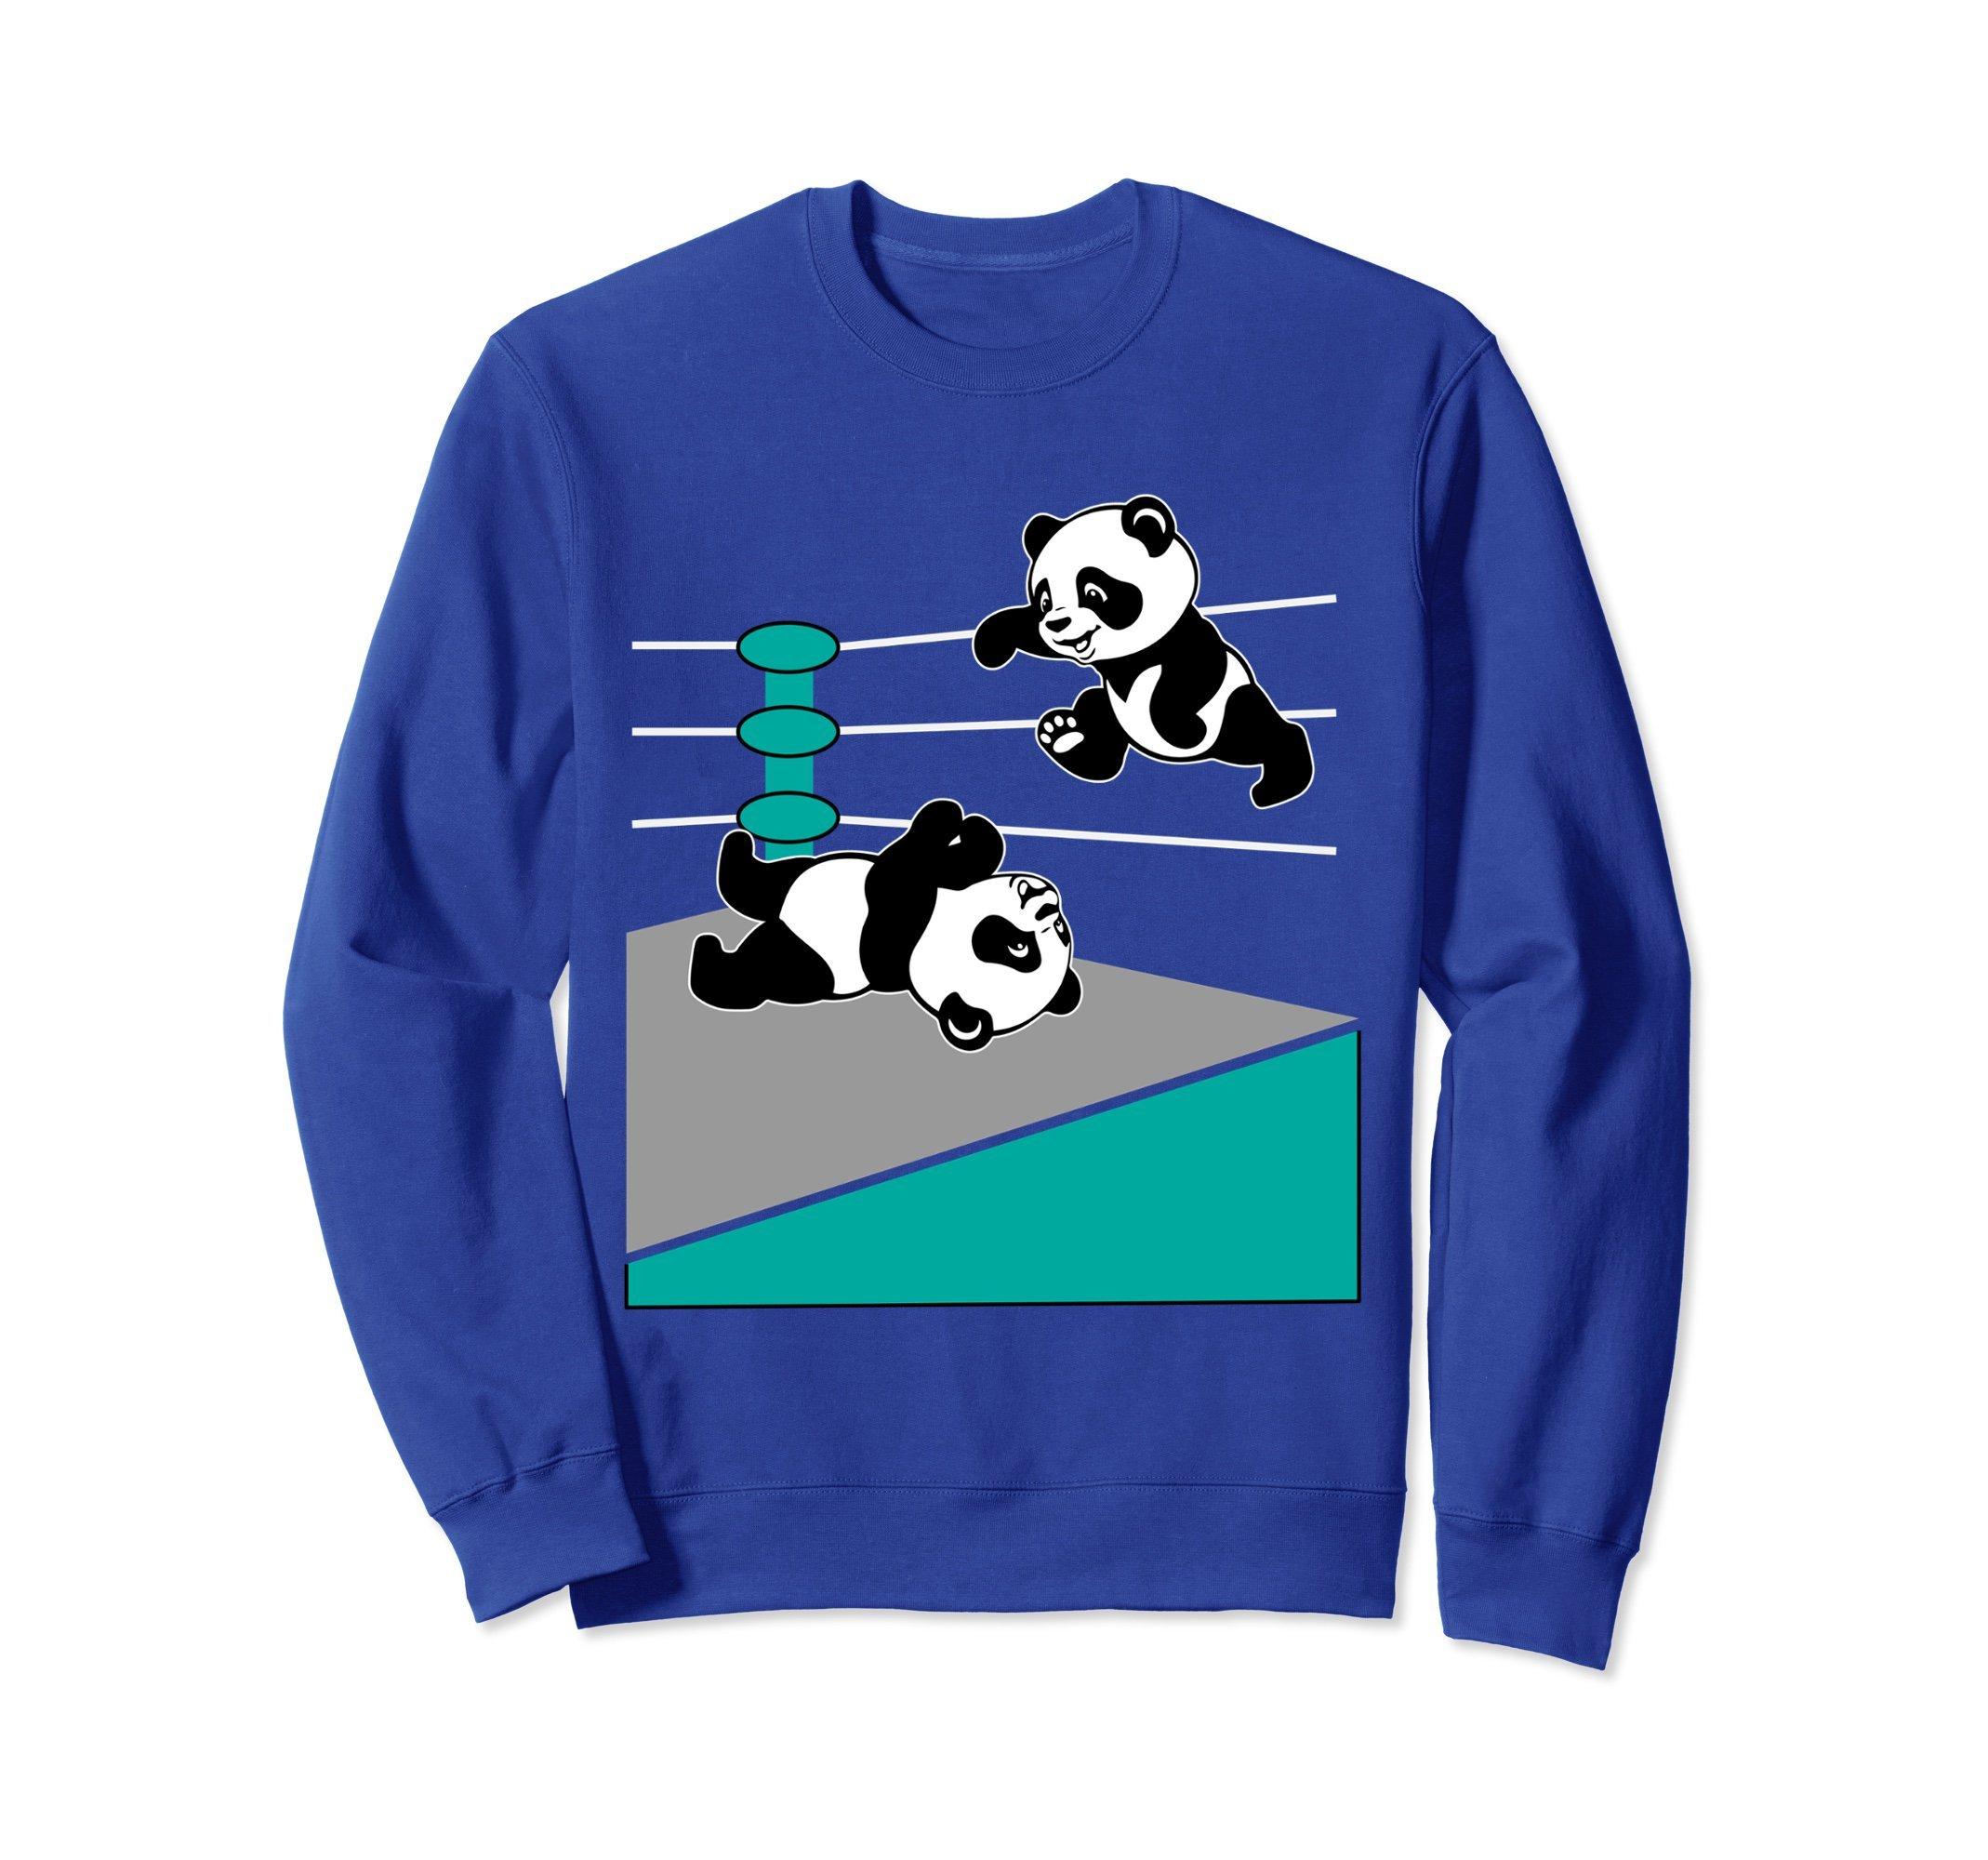 Unisex Wrestling Sweatshirt - Panda Wrestling Top Ropes Sweater Medium Royal Blue by Wrestling Sweatshirt by Crush Retro